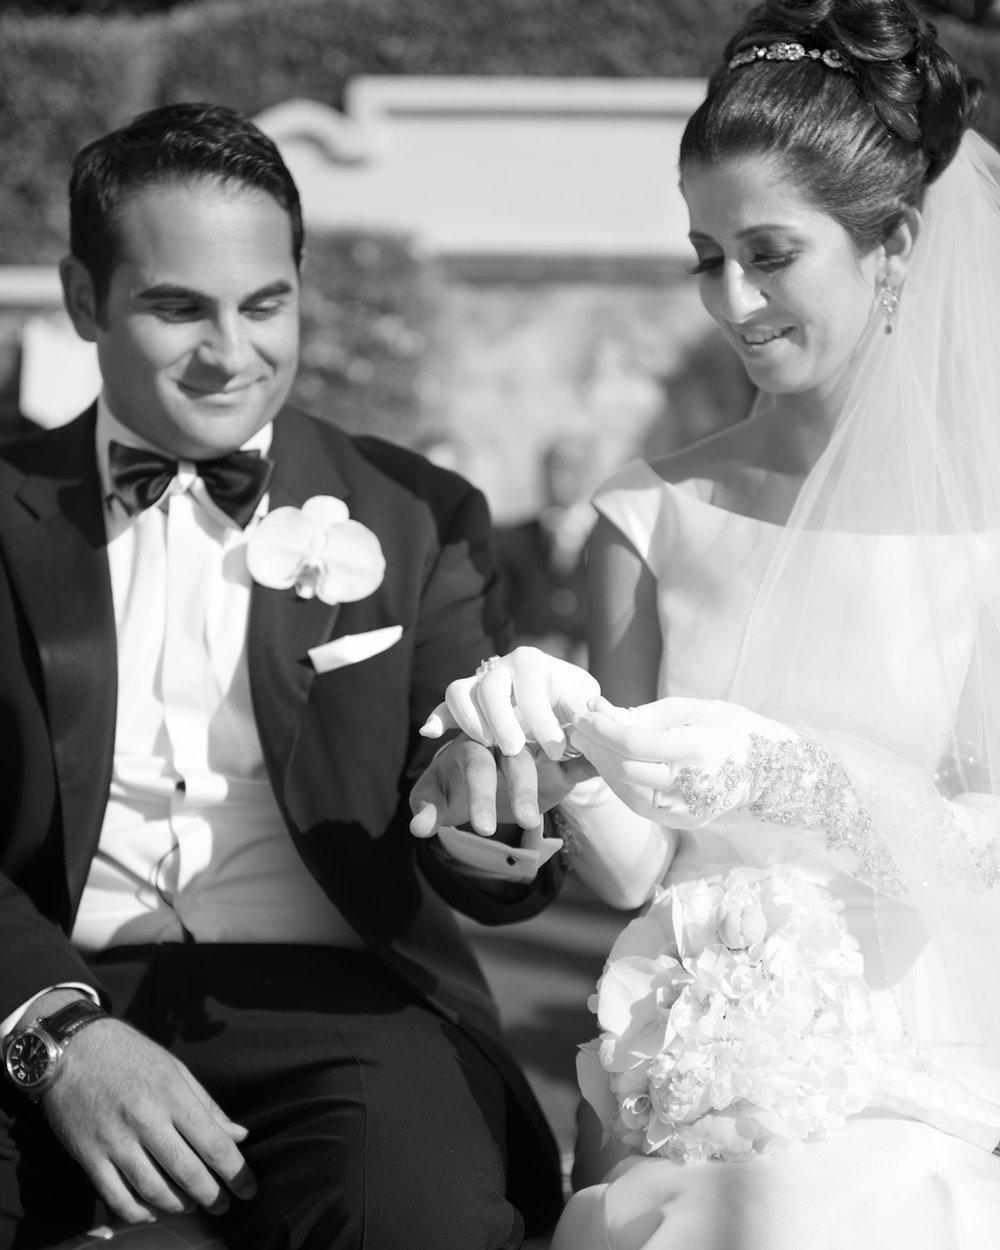 la-valencia-wedding-michal-pfeil-31.jpg